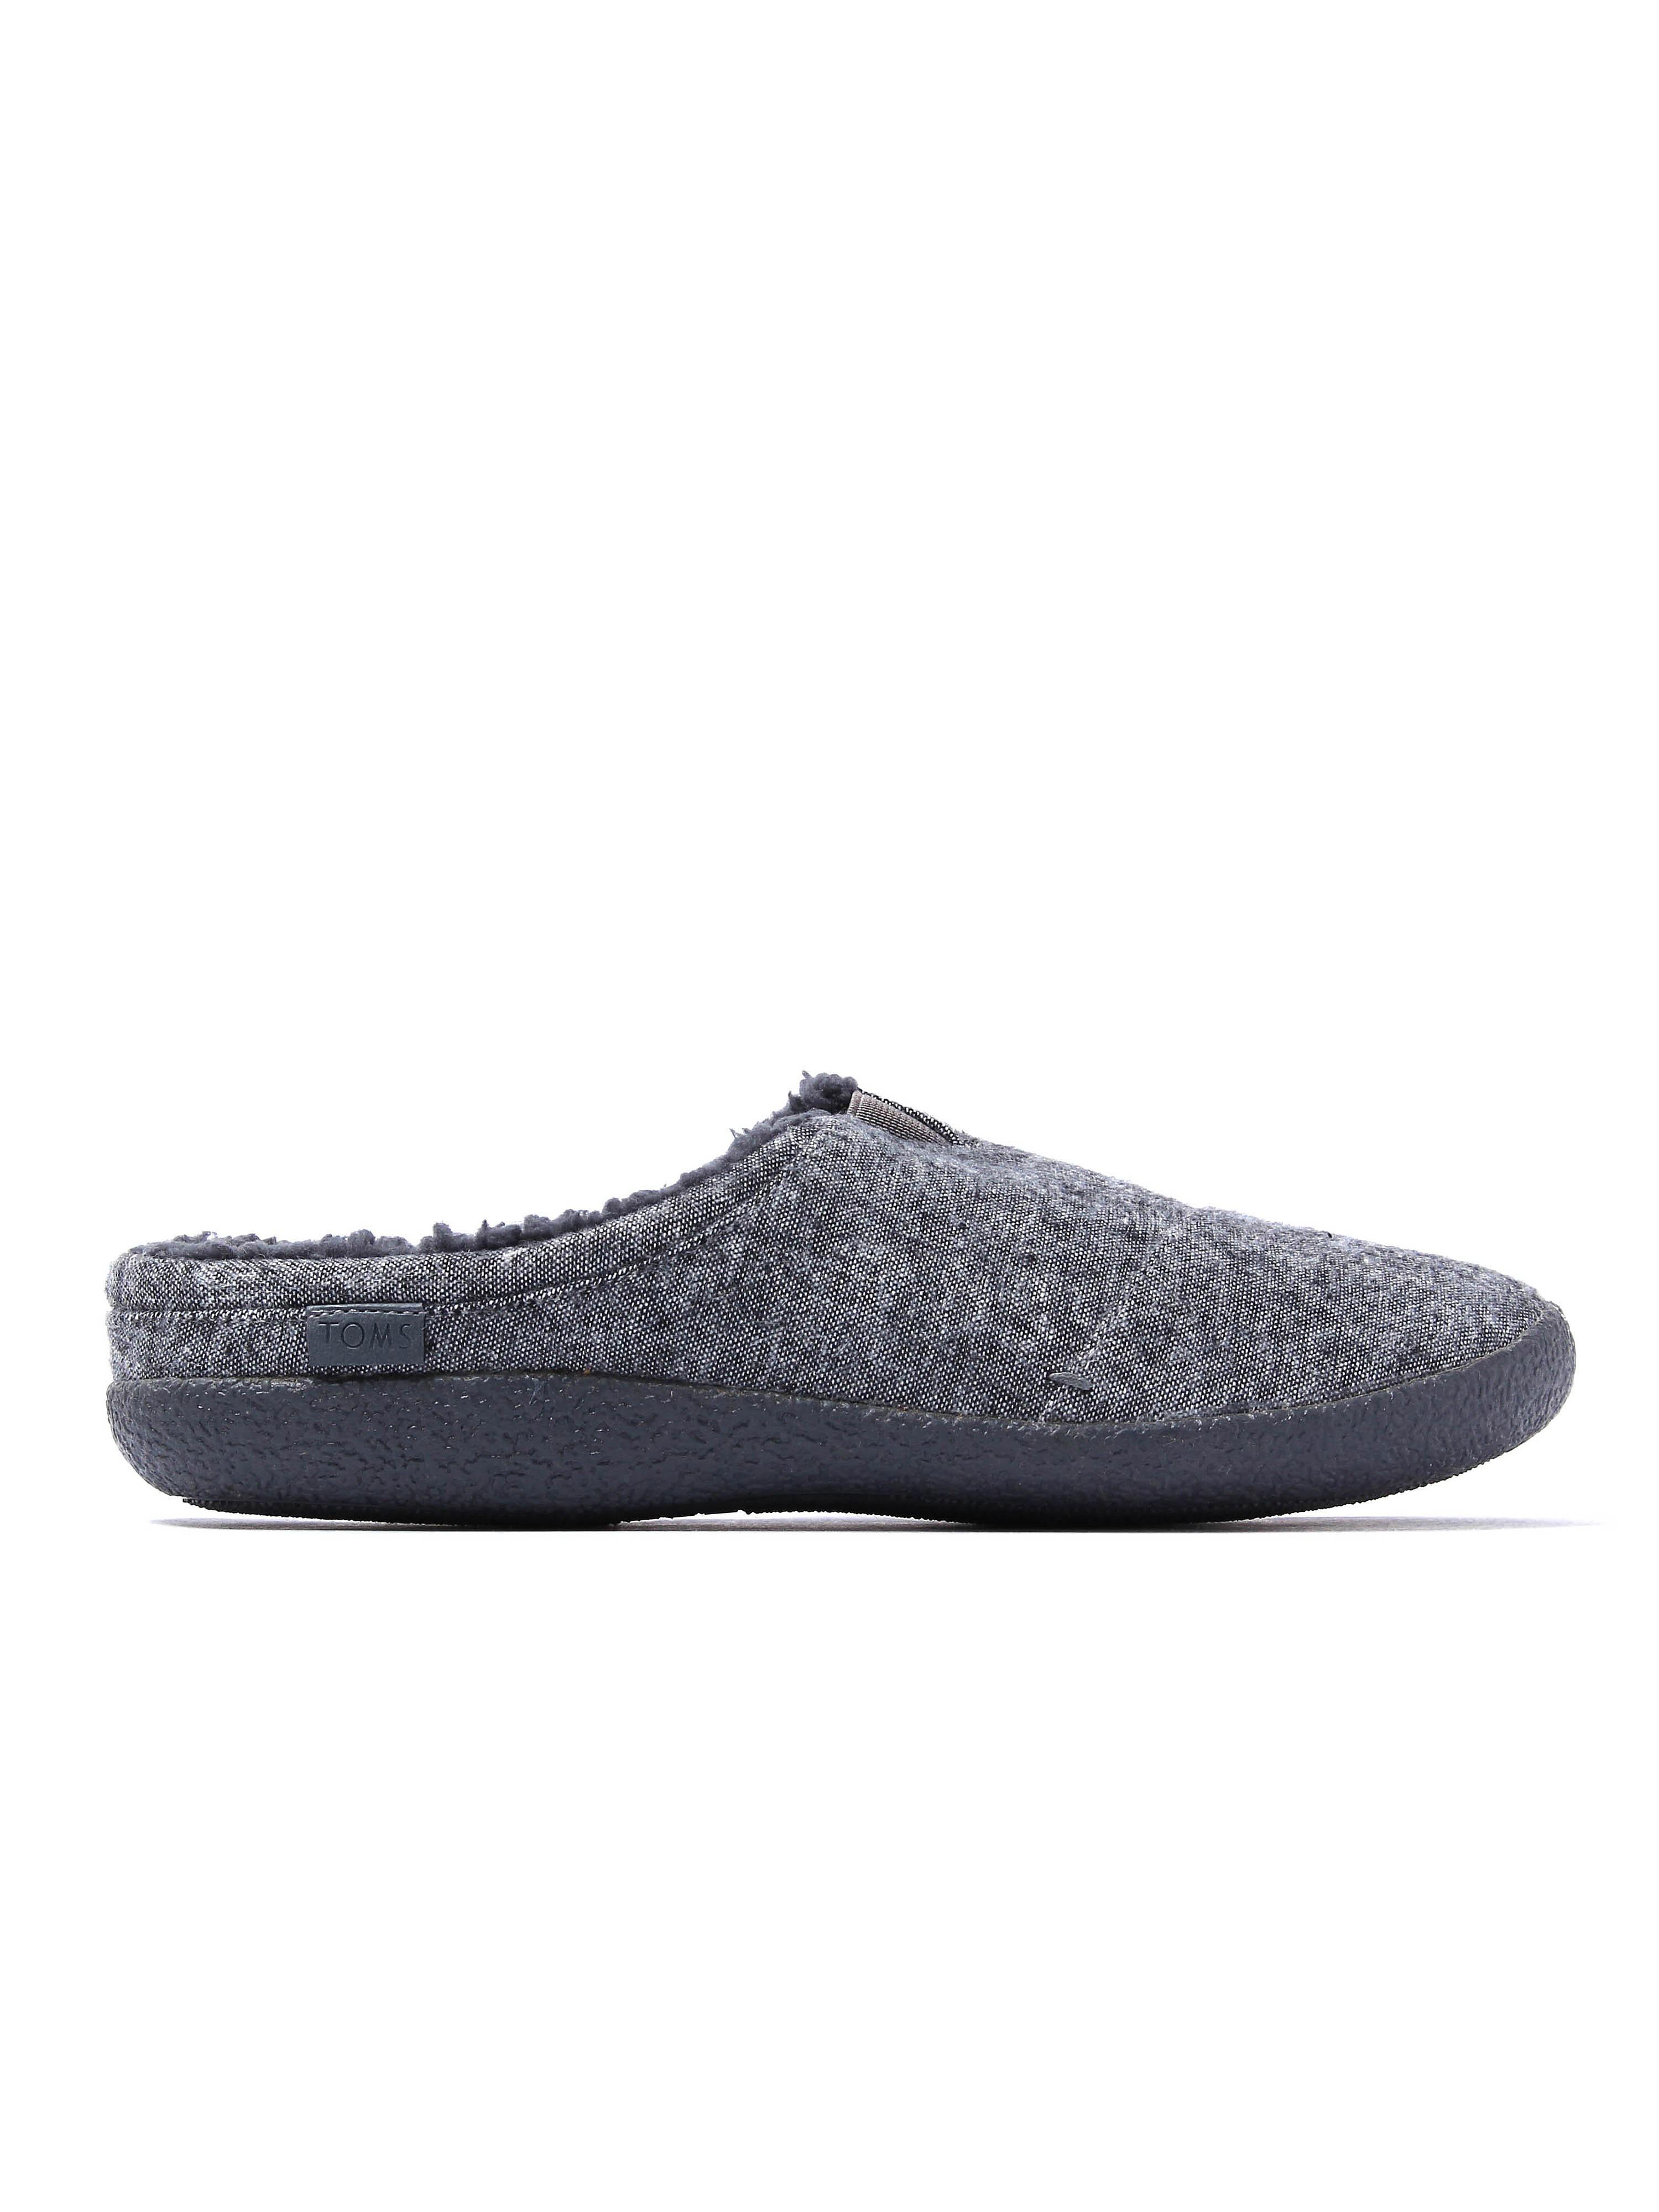 Toms Men's Berkeley Woven Mule Slippers - Grey Slub